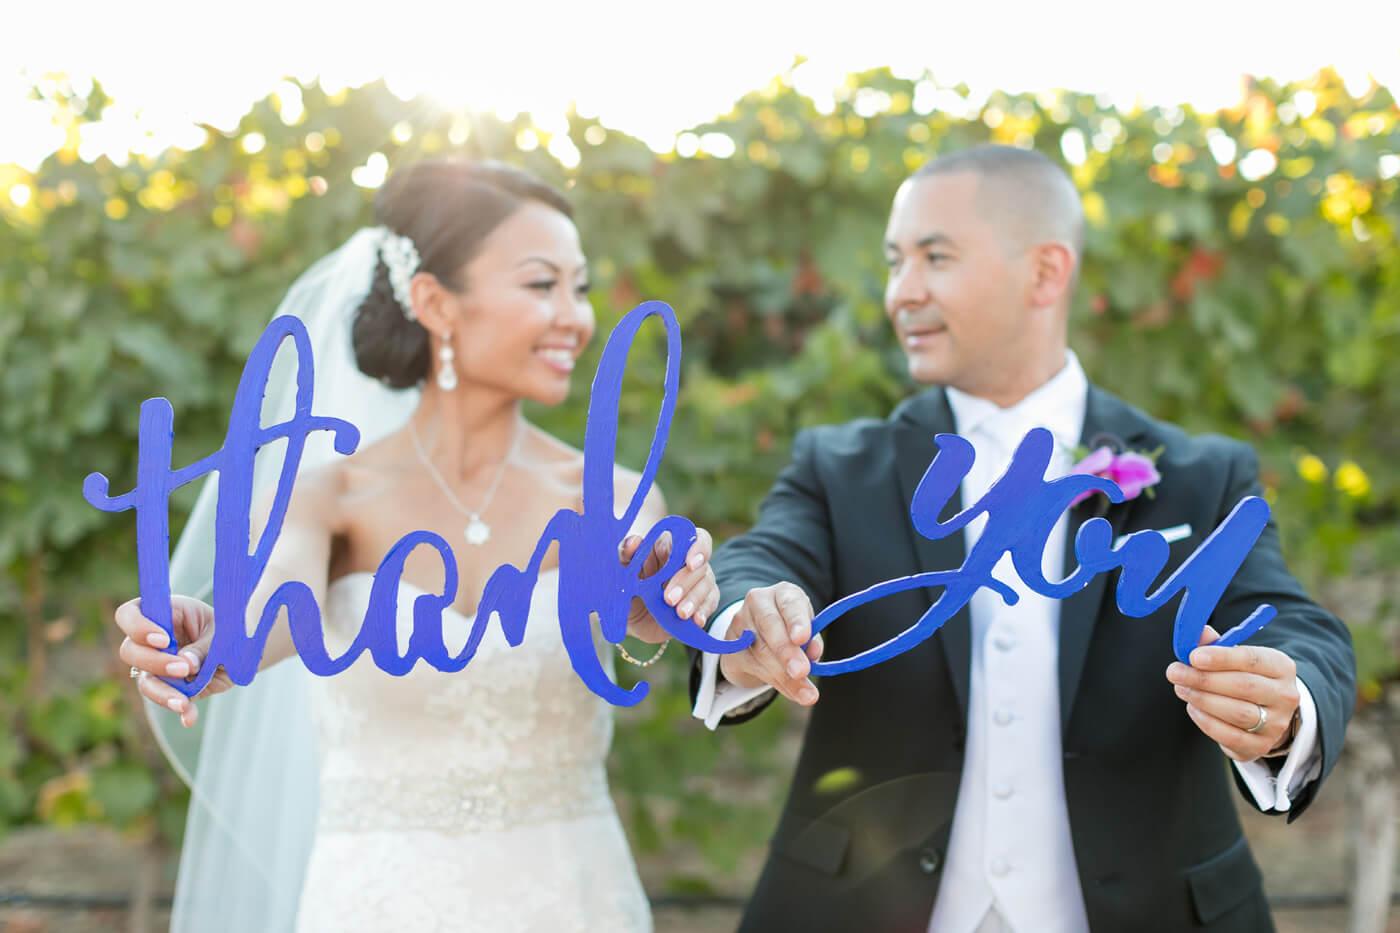 Brautpaar sagt Danke